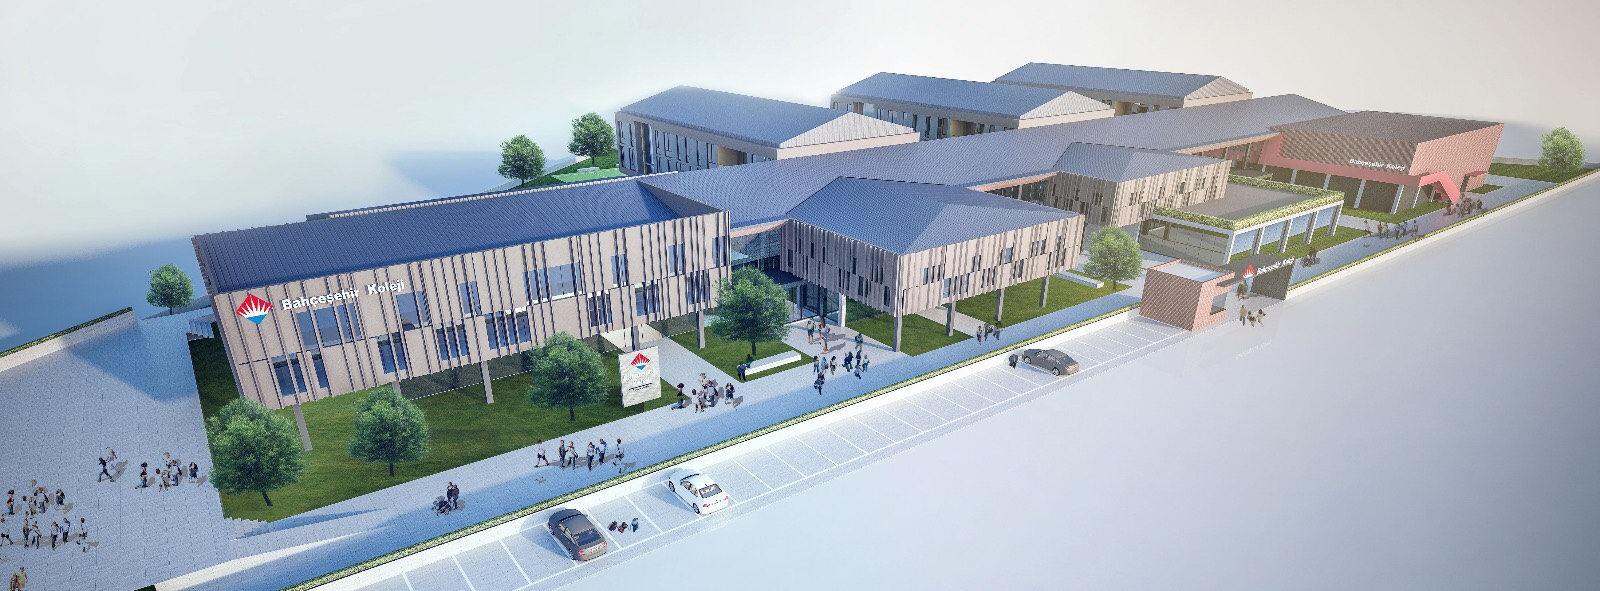 Bahçeşehir Koleji Erzurum Anadolu Lisesi